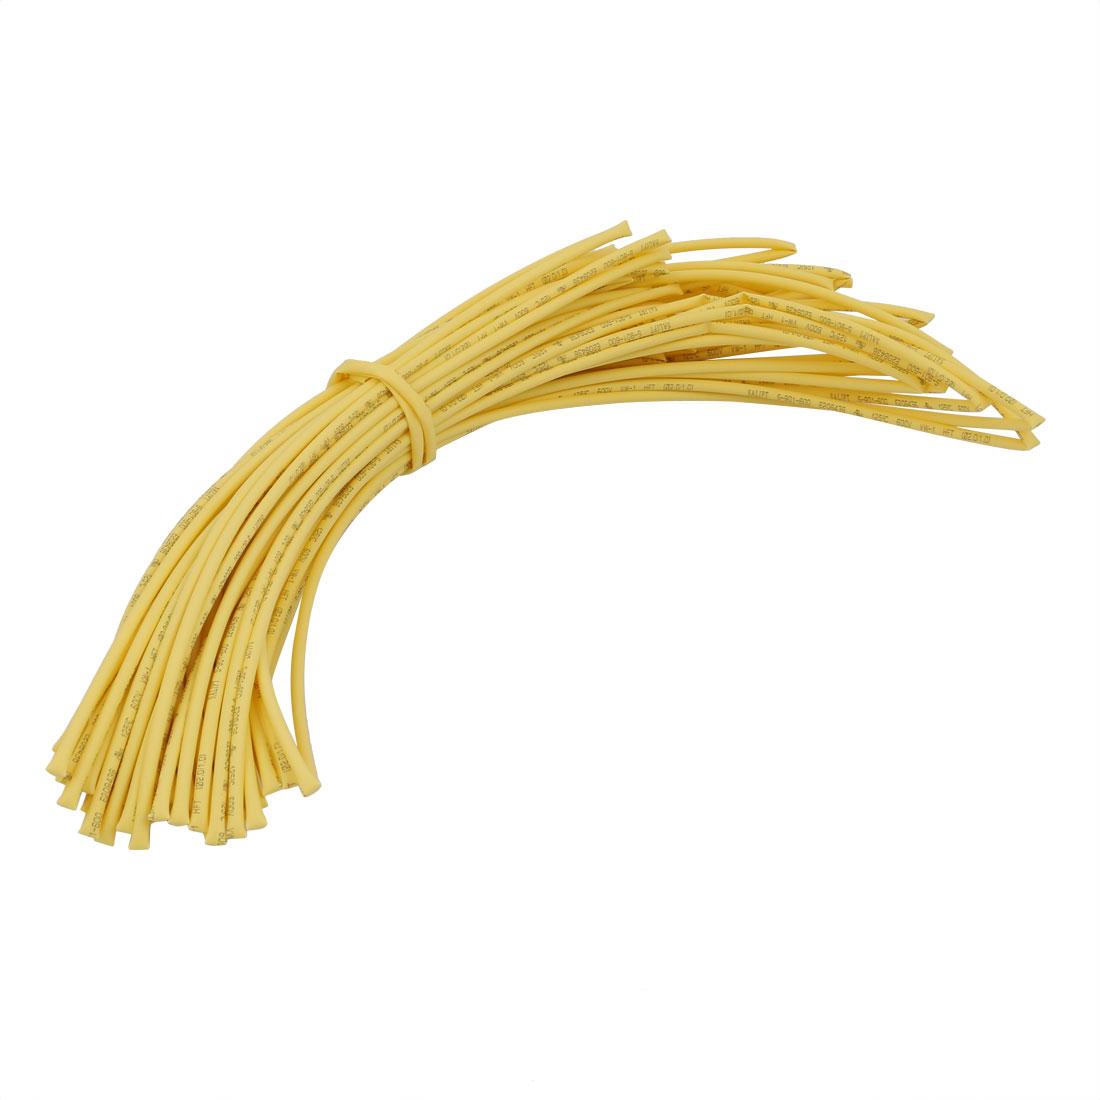 20M 0.08in Inner Dia Polyolefin Flame Retardant Tube Yellow for Wire Repairing